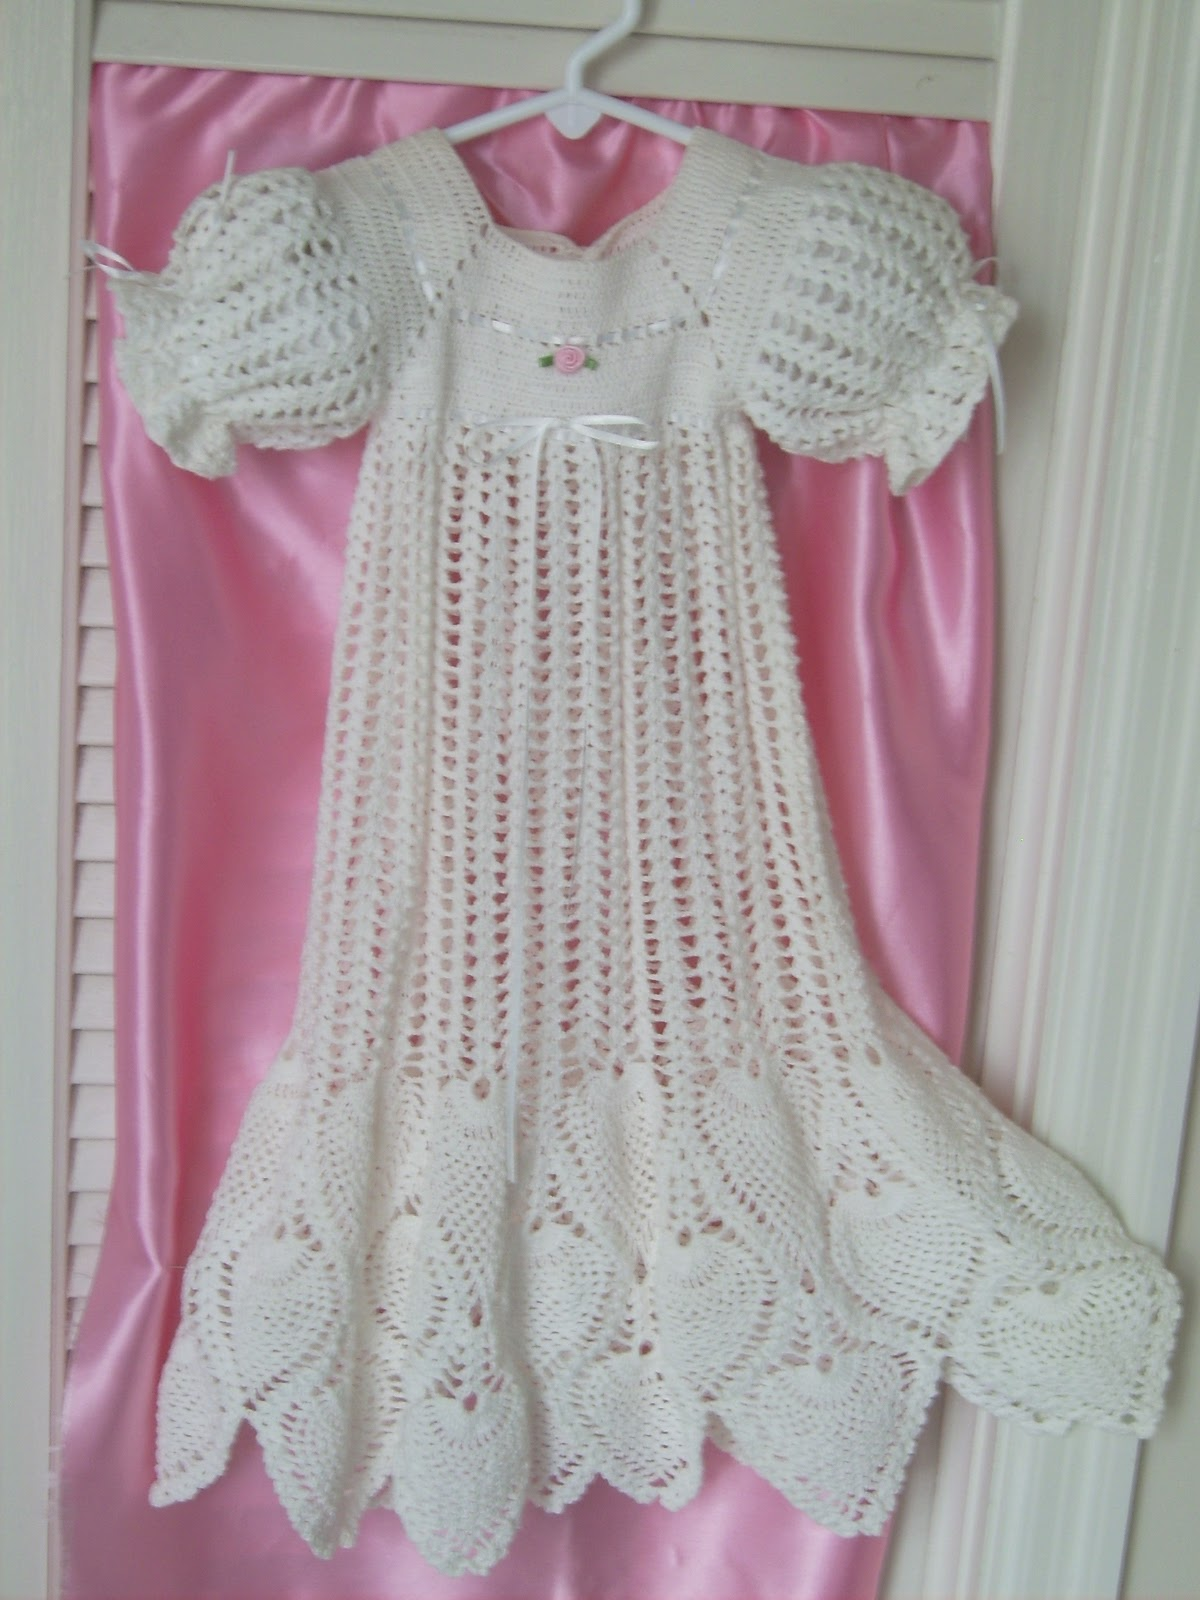 Crochet Pattern For Christening Gown : antiquebeginnings: Hand Crochet Pineapple Christening Gown